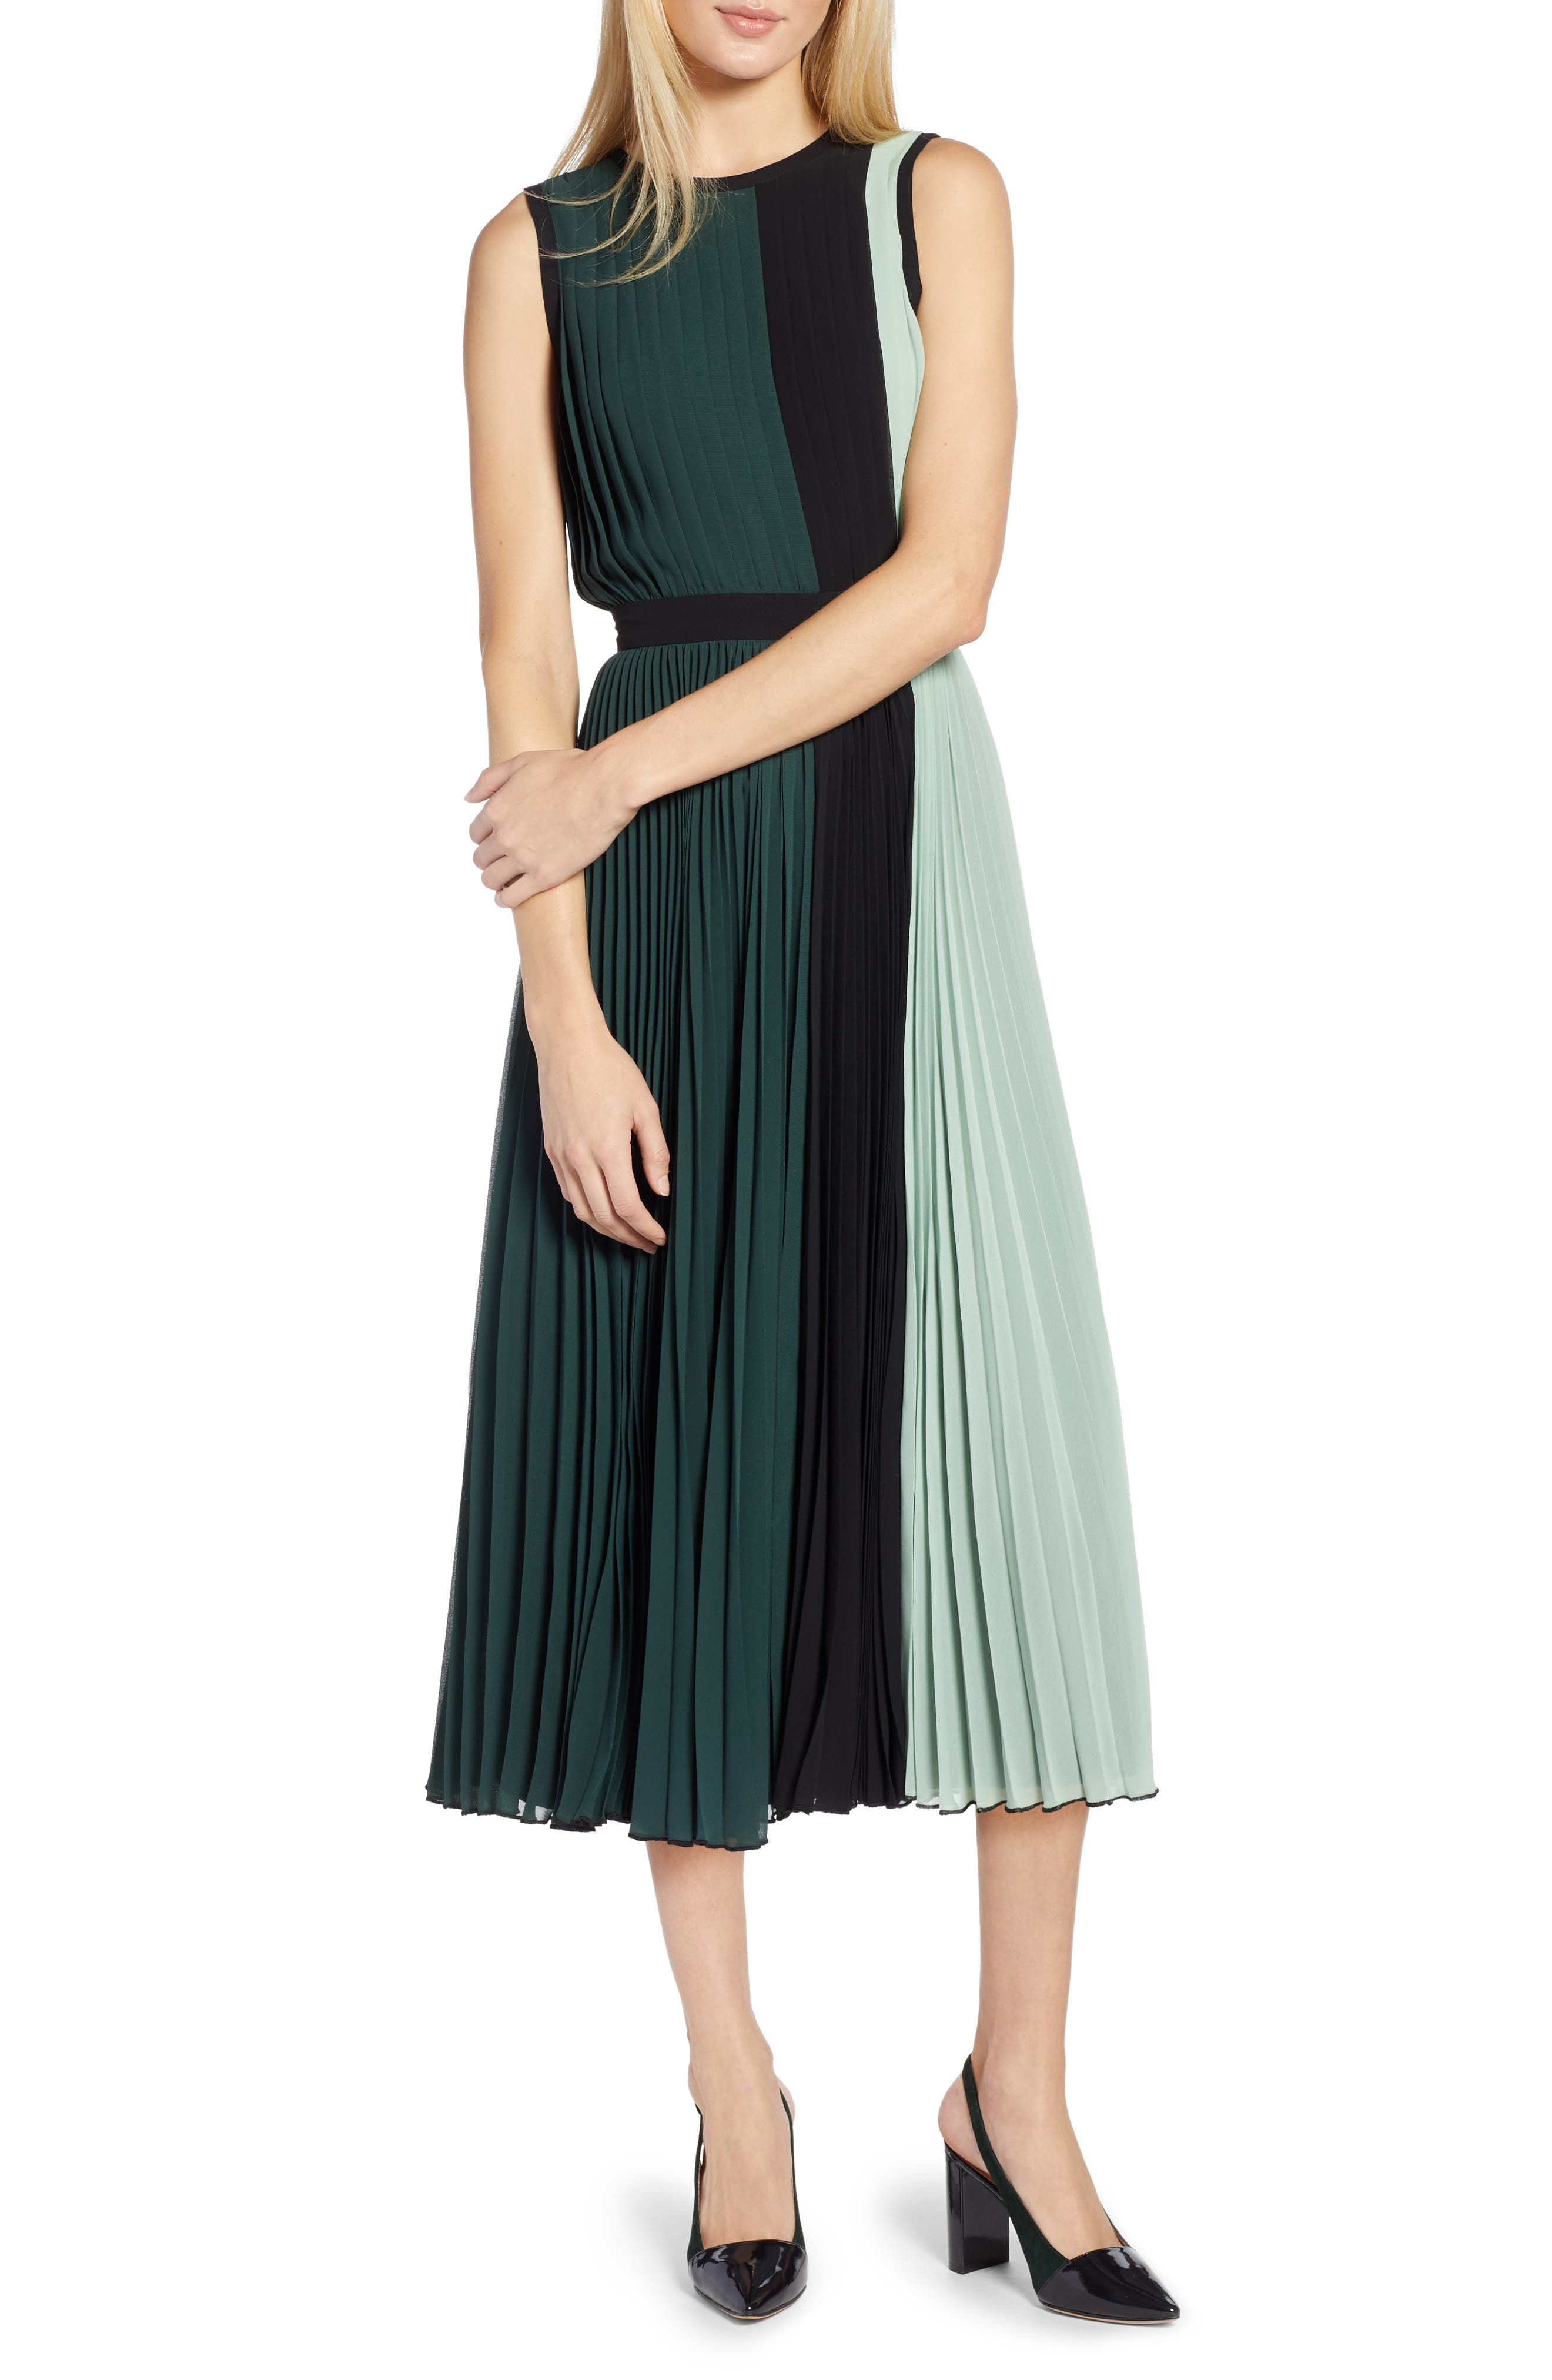 petite women's halogen x atlantic-pacific colorblock pleated midi dress, size 6p - green